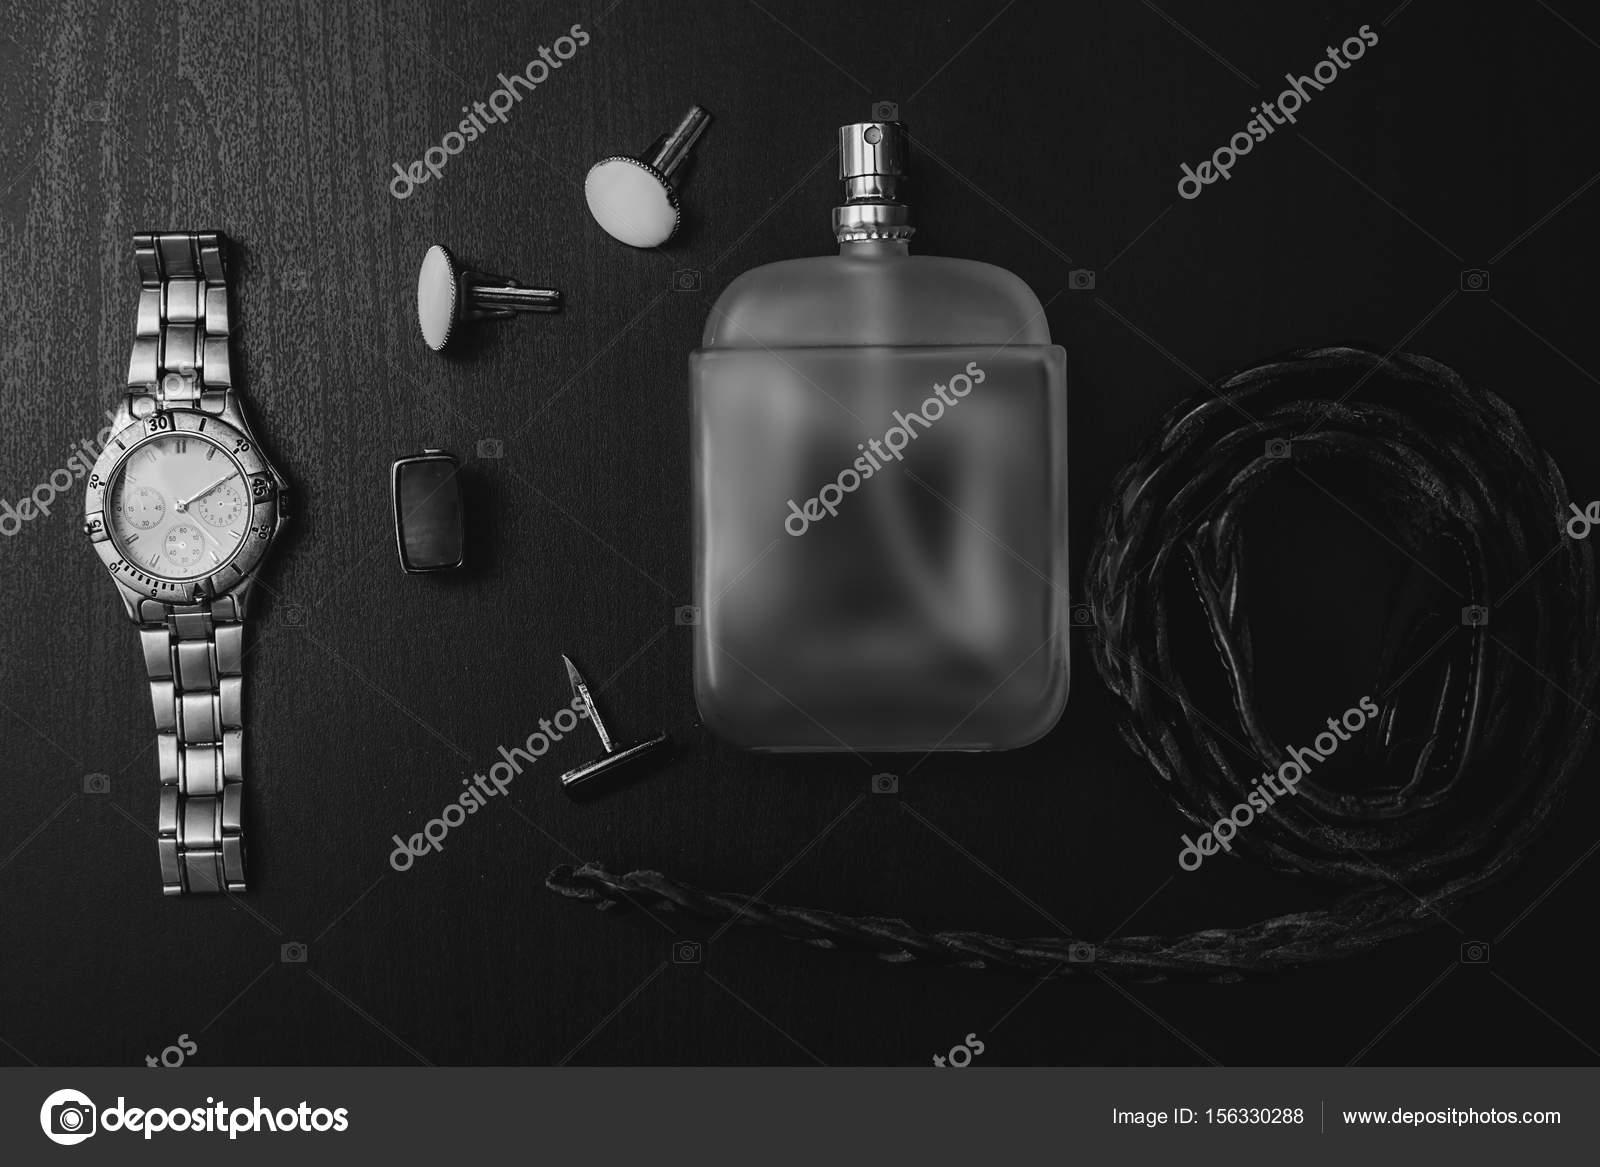 2d083602fee Ανδρικά αξεσουάρ. Παρακολουθήστε με άρωμα και μανσέτα — Φωτογραφία ...